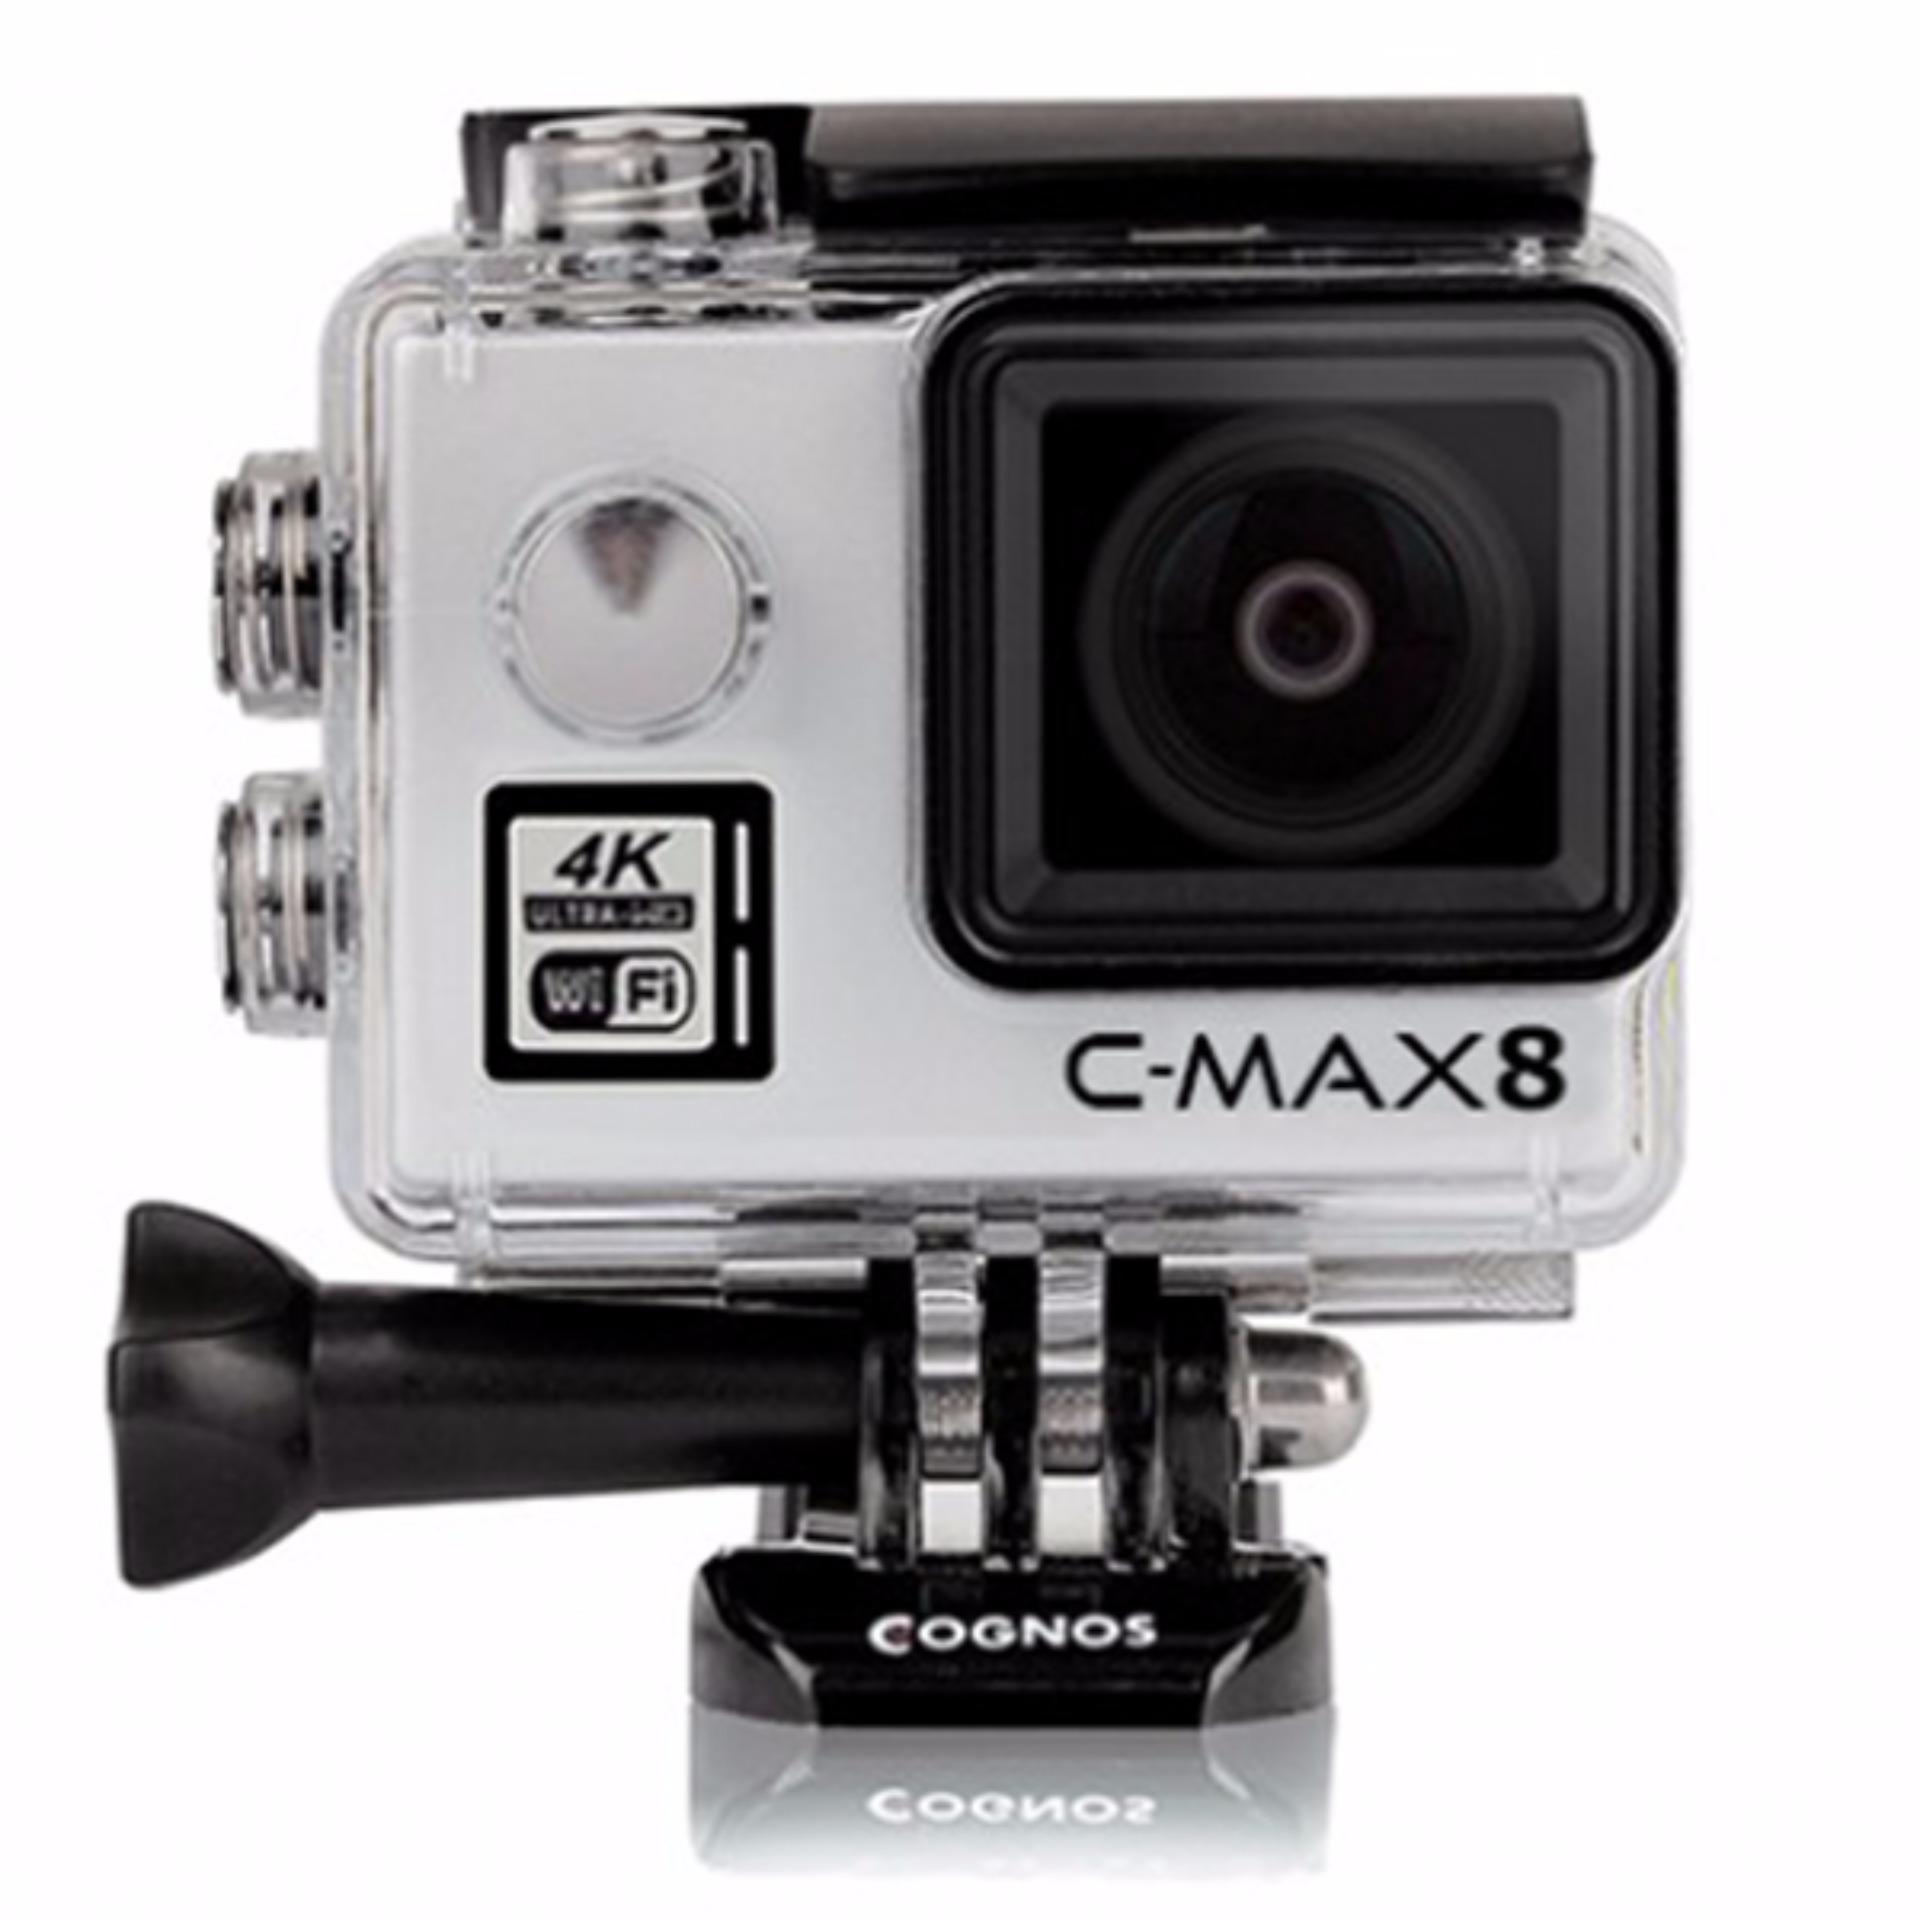 Eshop Checker Cognos Omega 4k C Max 8 Action Camera 16 Mp Mika Box Bagus Silver